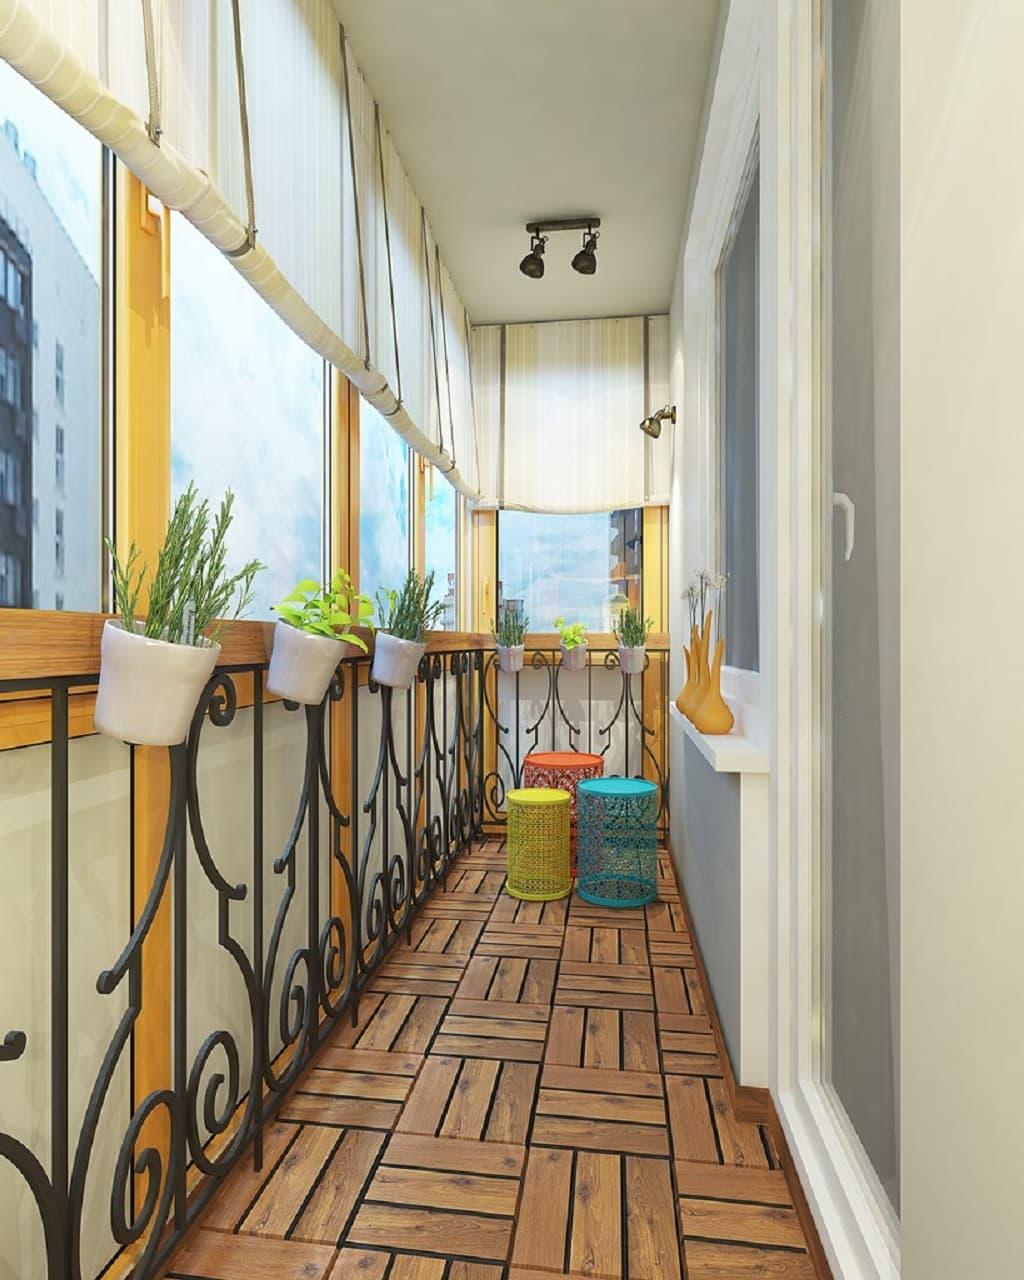 Дизайн балкона / интерьер / балкон, веранда / pinme.ru / pin.